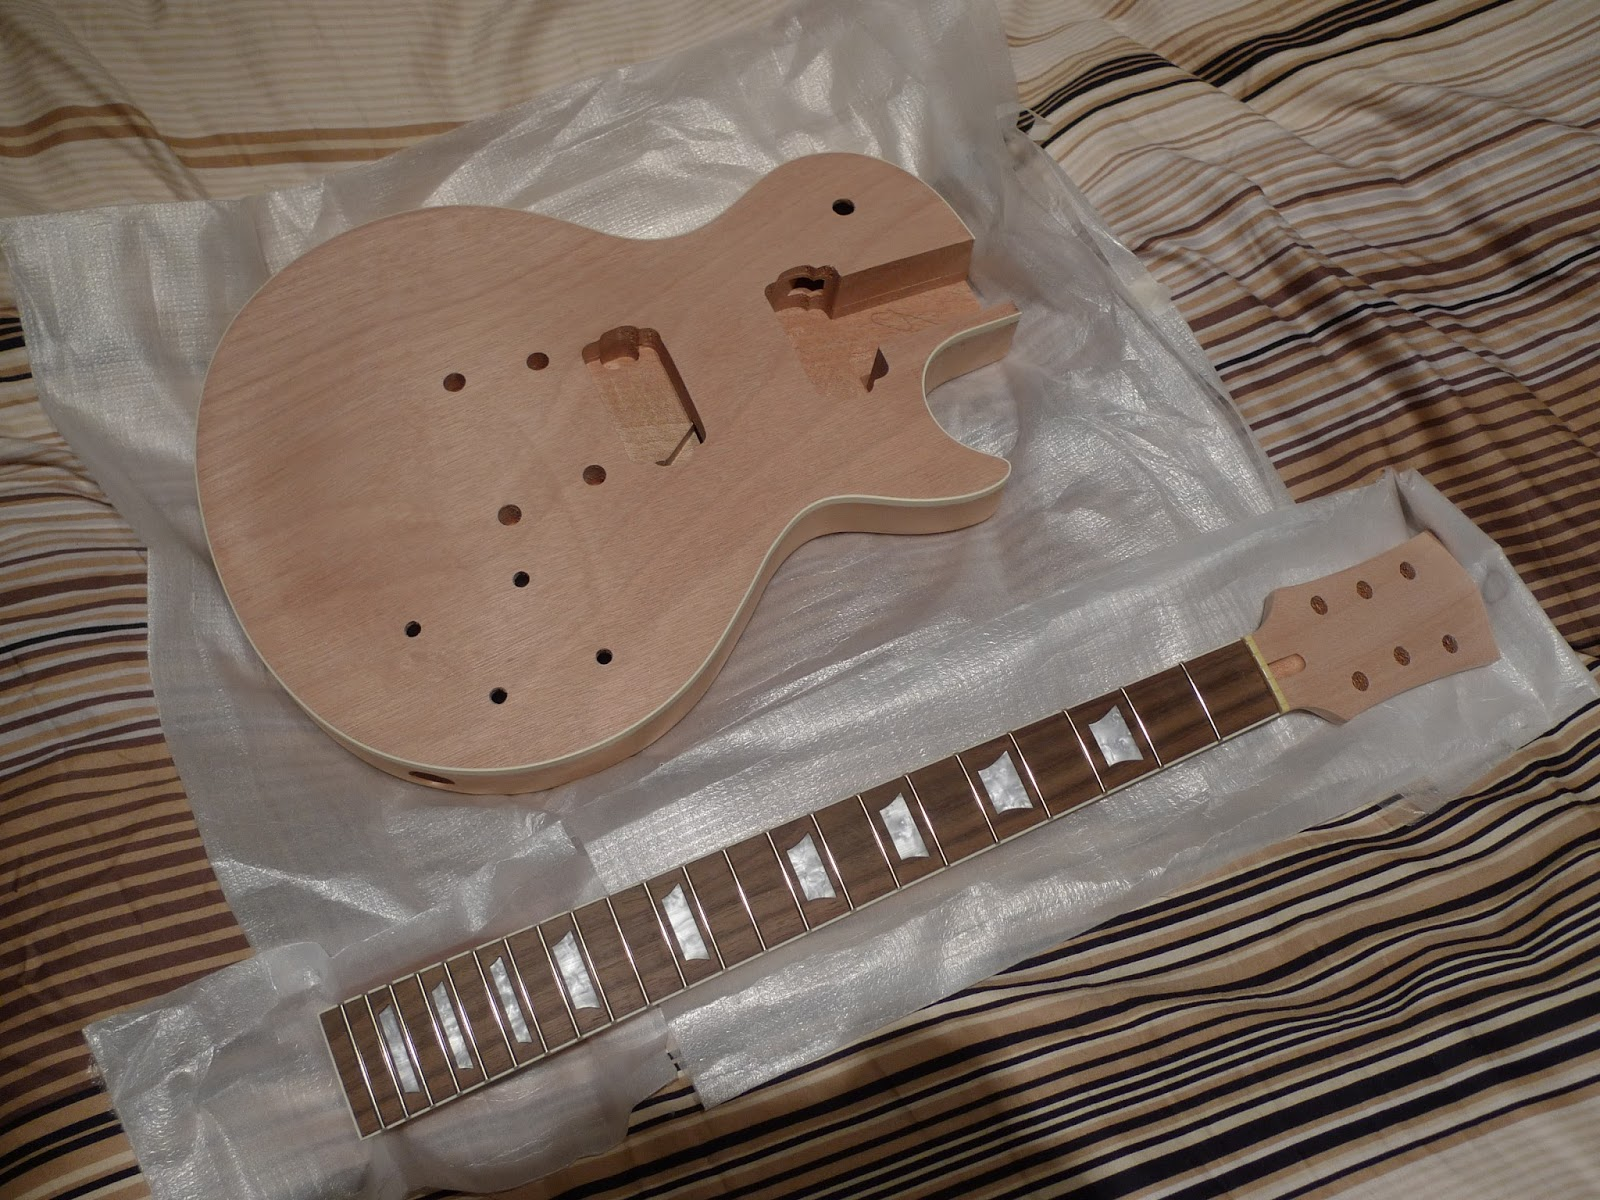 sr system audio kit diy guitare type les paul. Black Bedroom Furniture Sets. Home Design Ideas